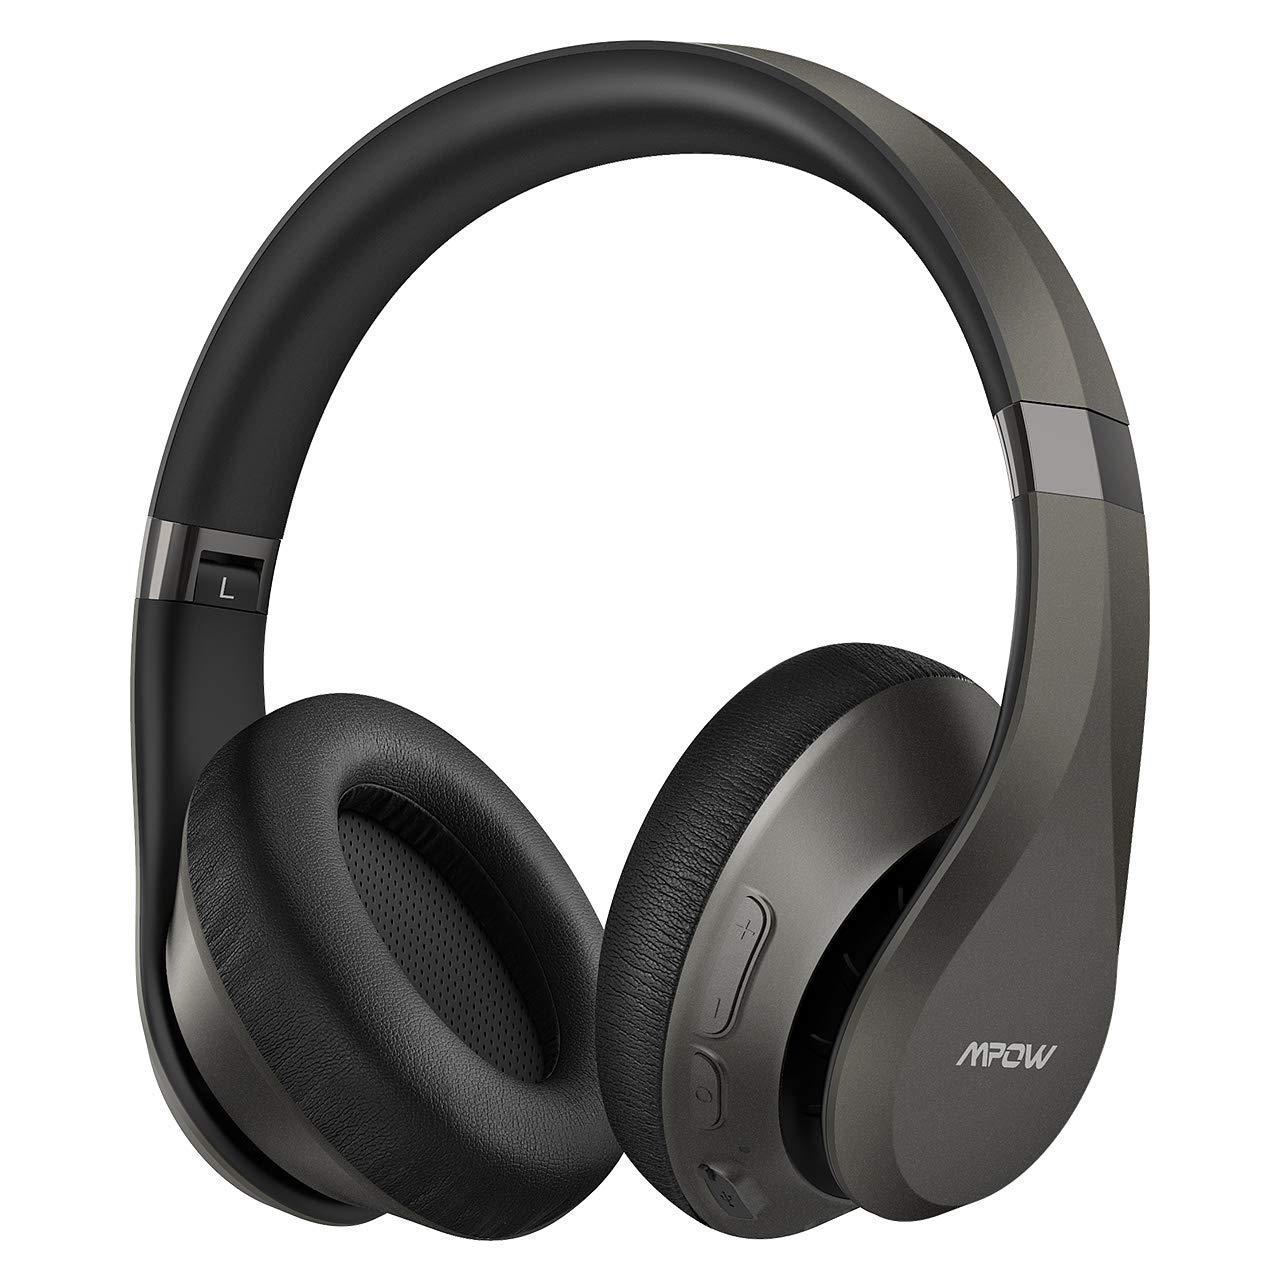 Mpow H20 Bluetooth Headphones Price In Pakistan Vmart Pk